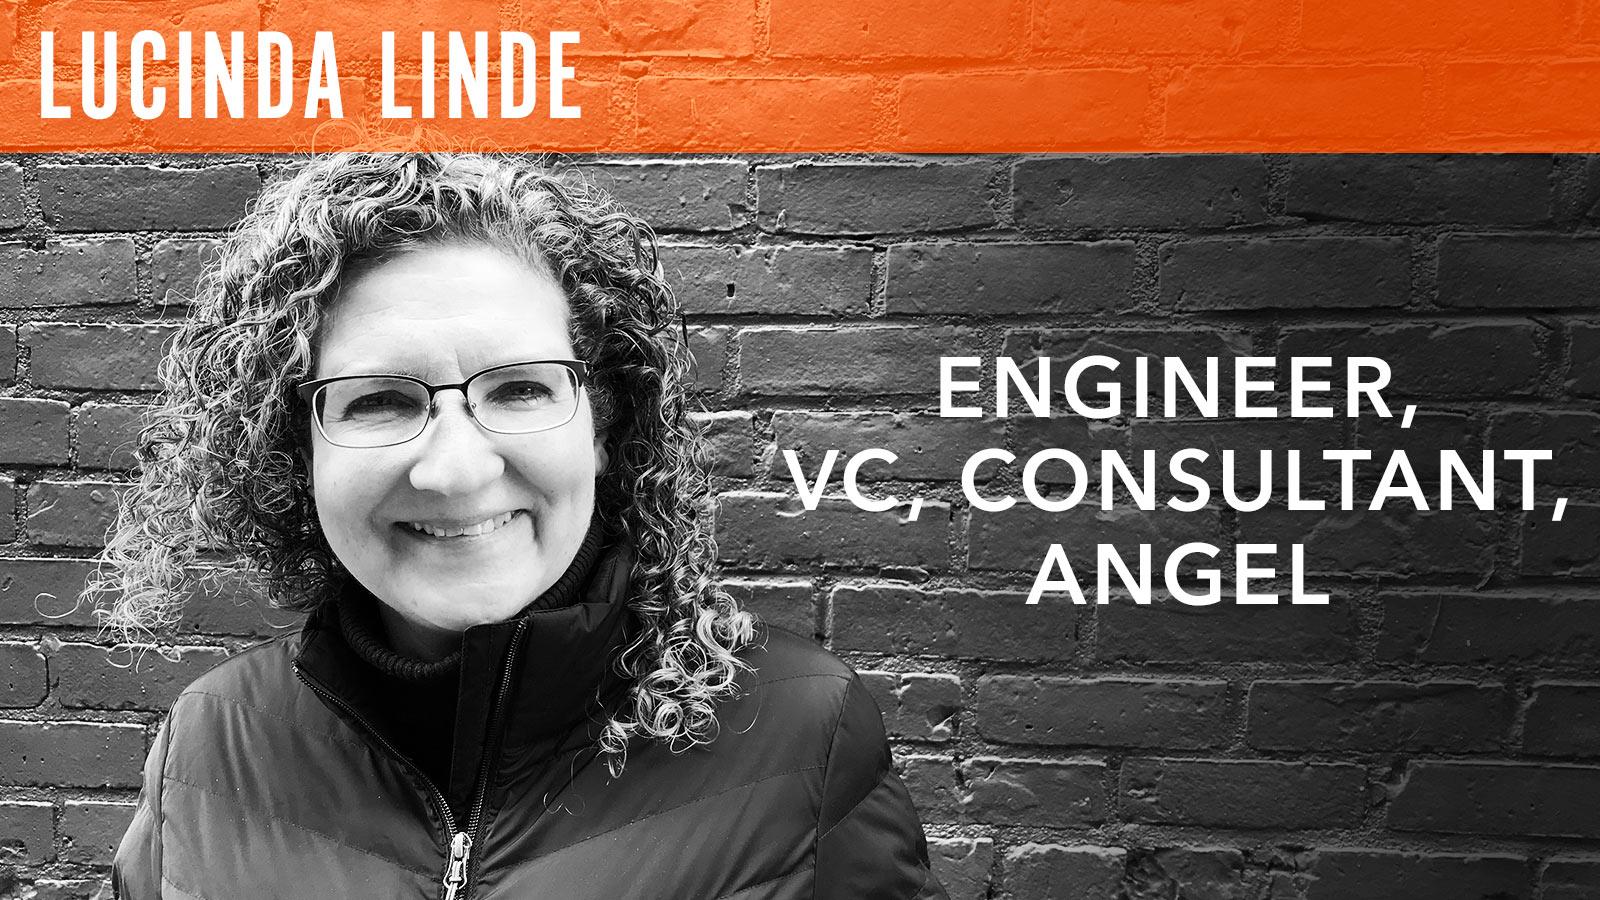 Lucinda Linde  Engineer, VC, Consultant, Angel